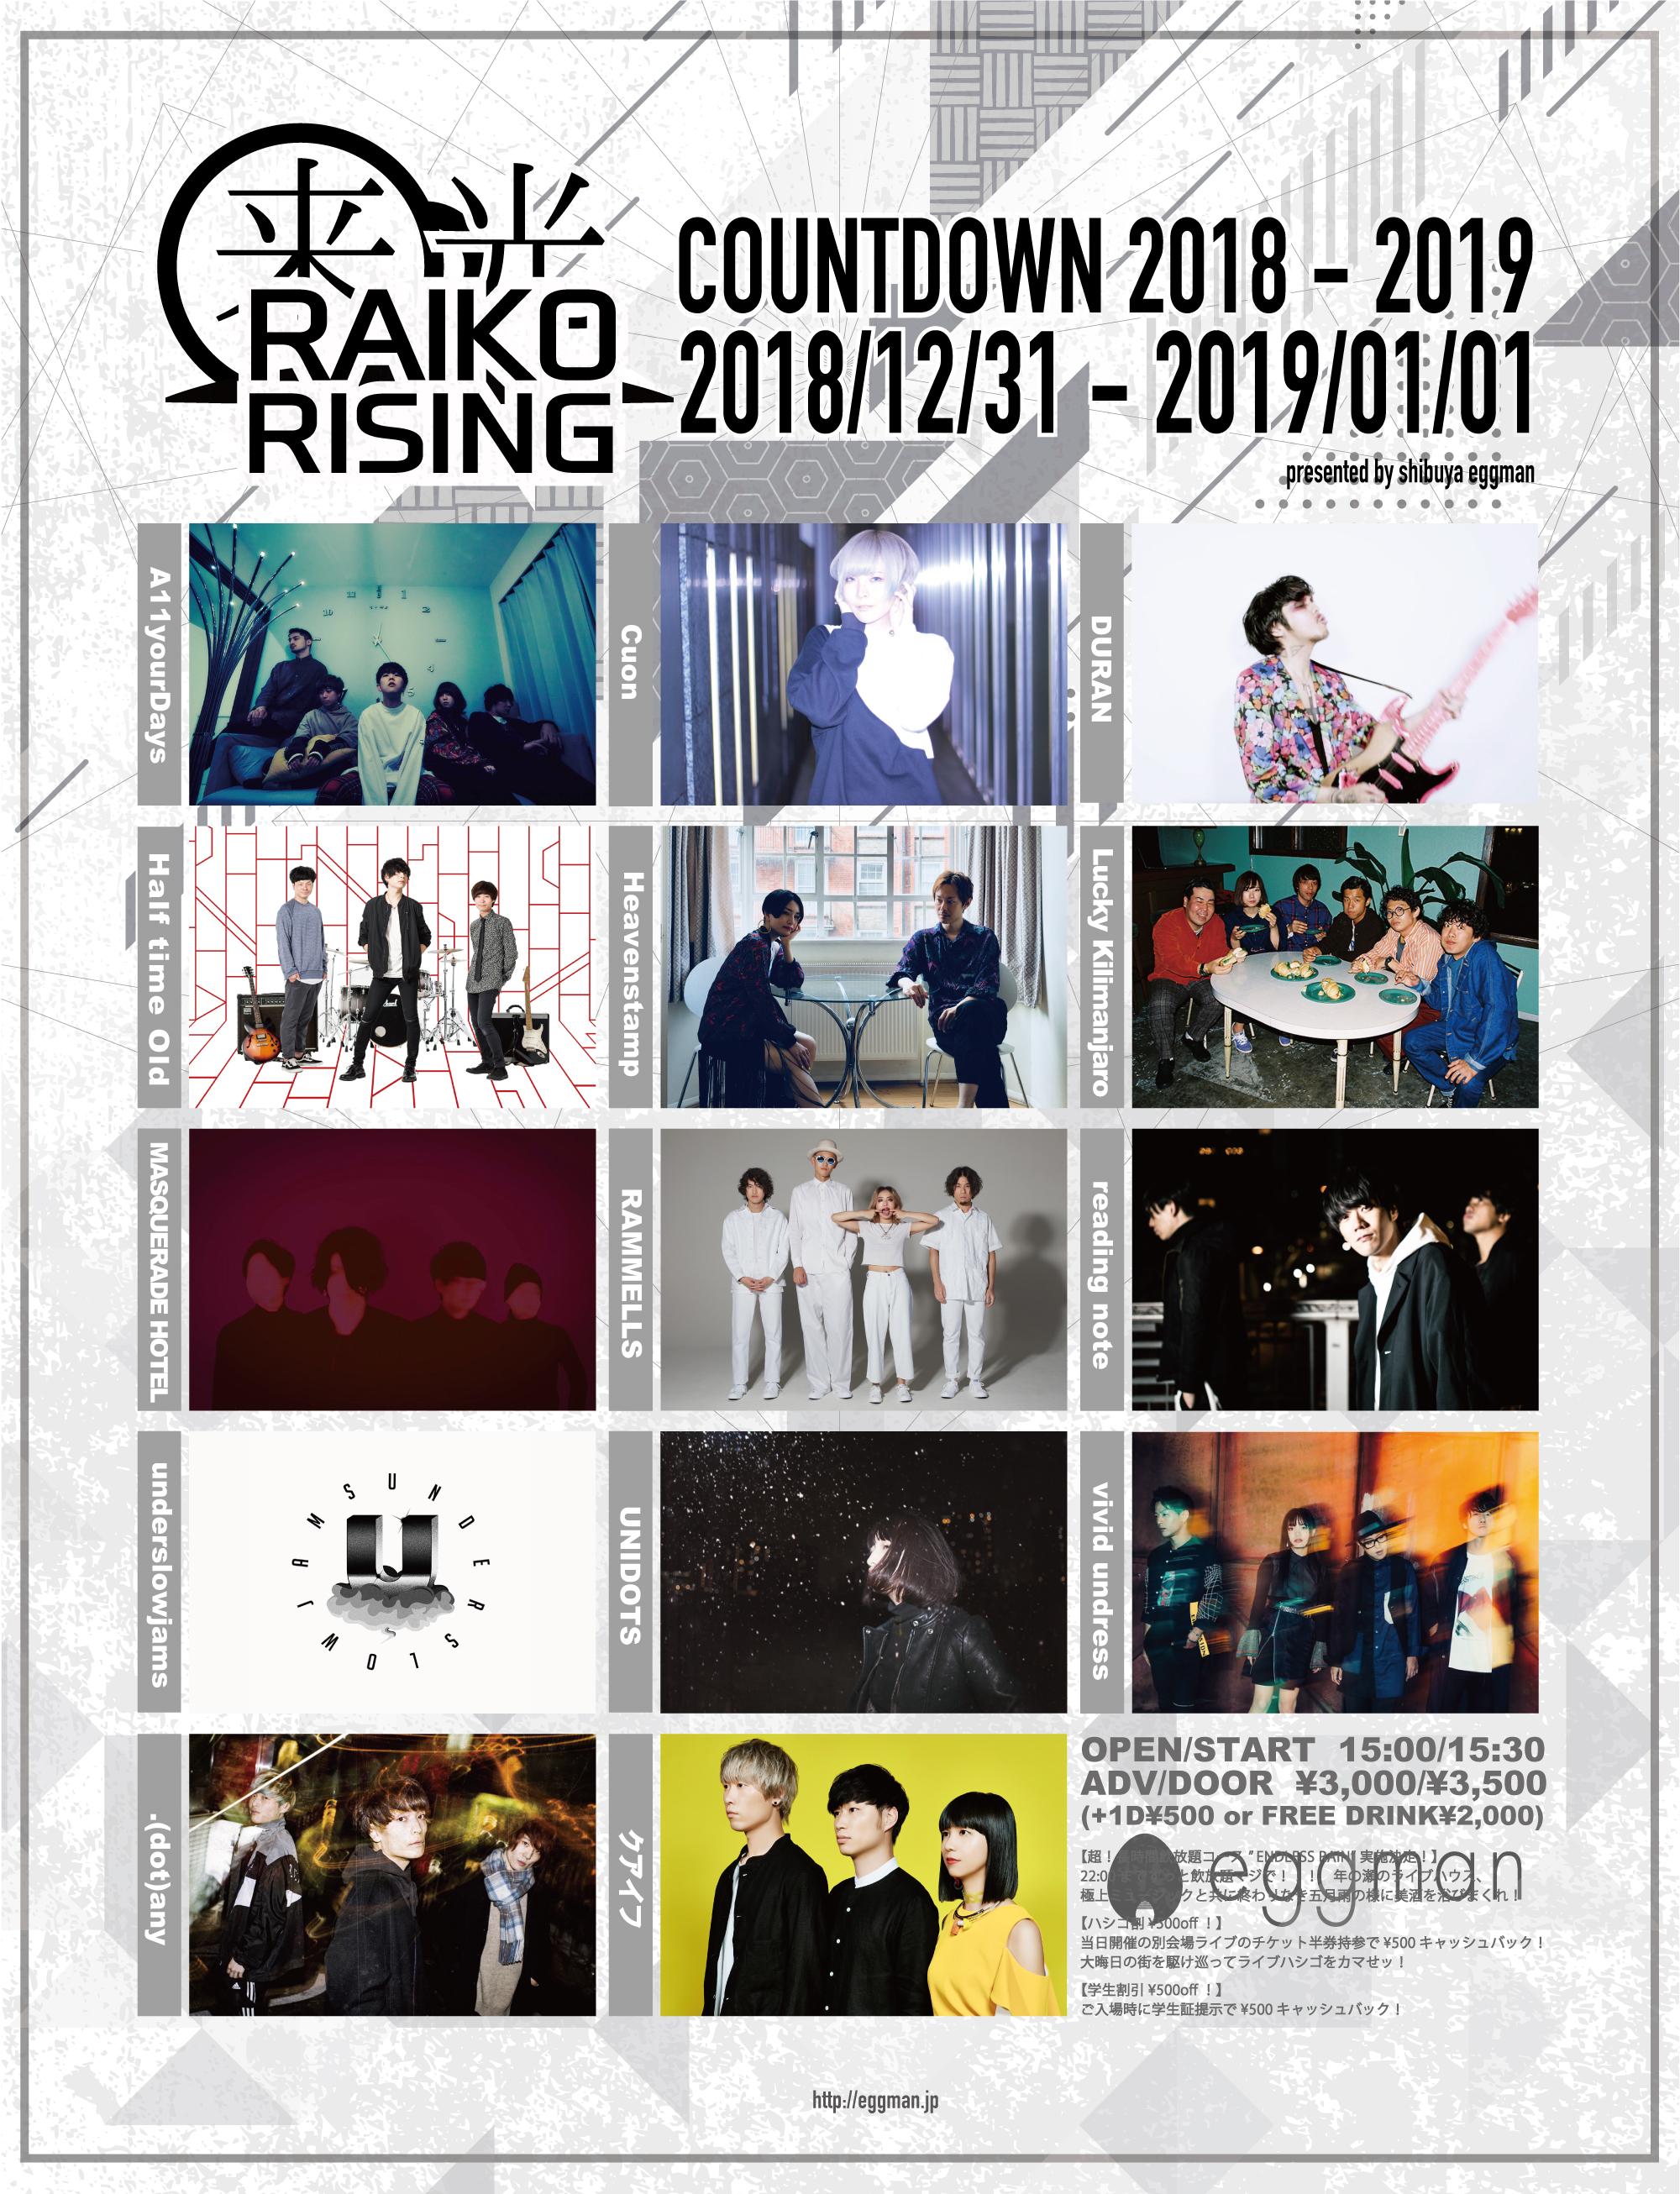 [ RAIKO -来光- RISING COUNTDOWN 2018-2019 ]